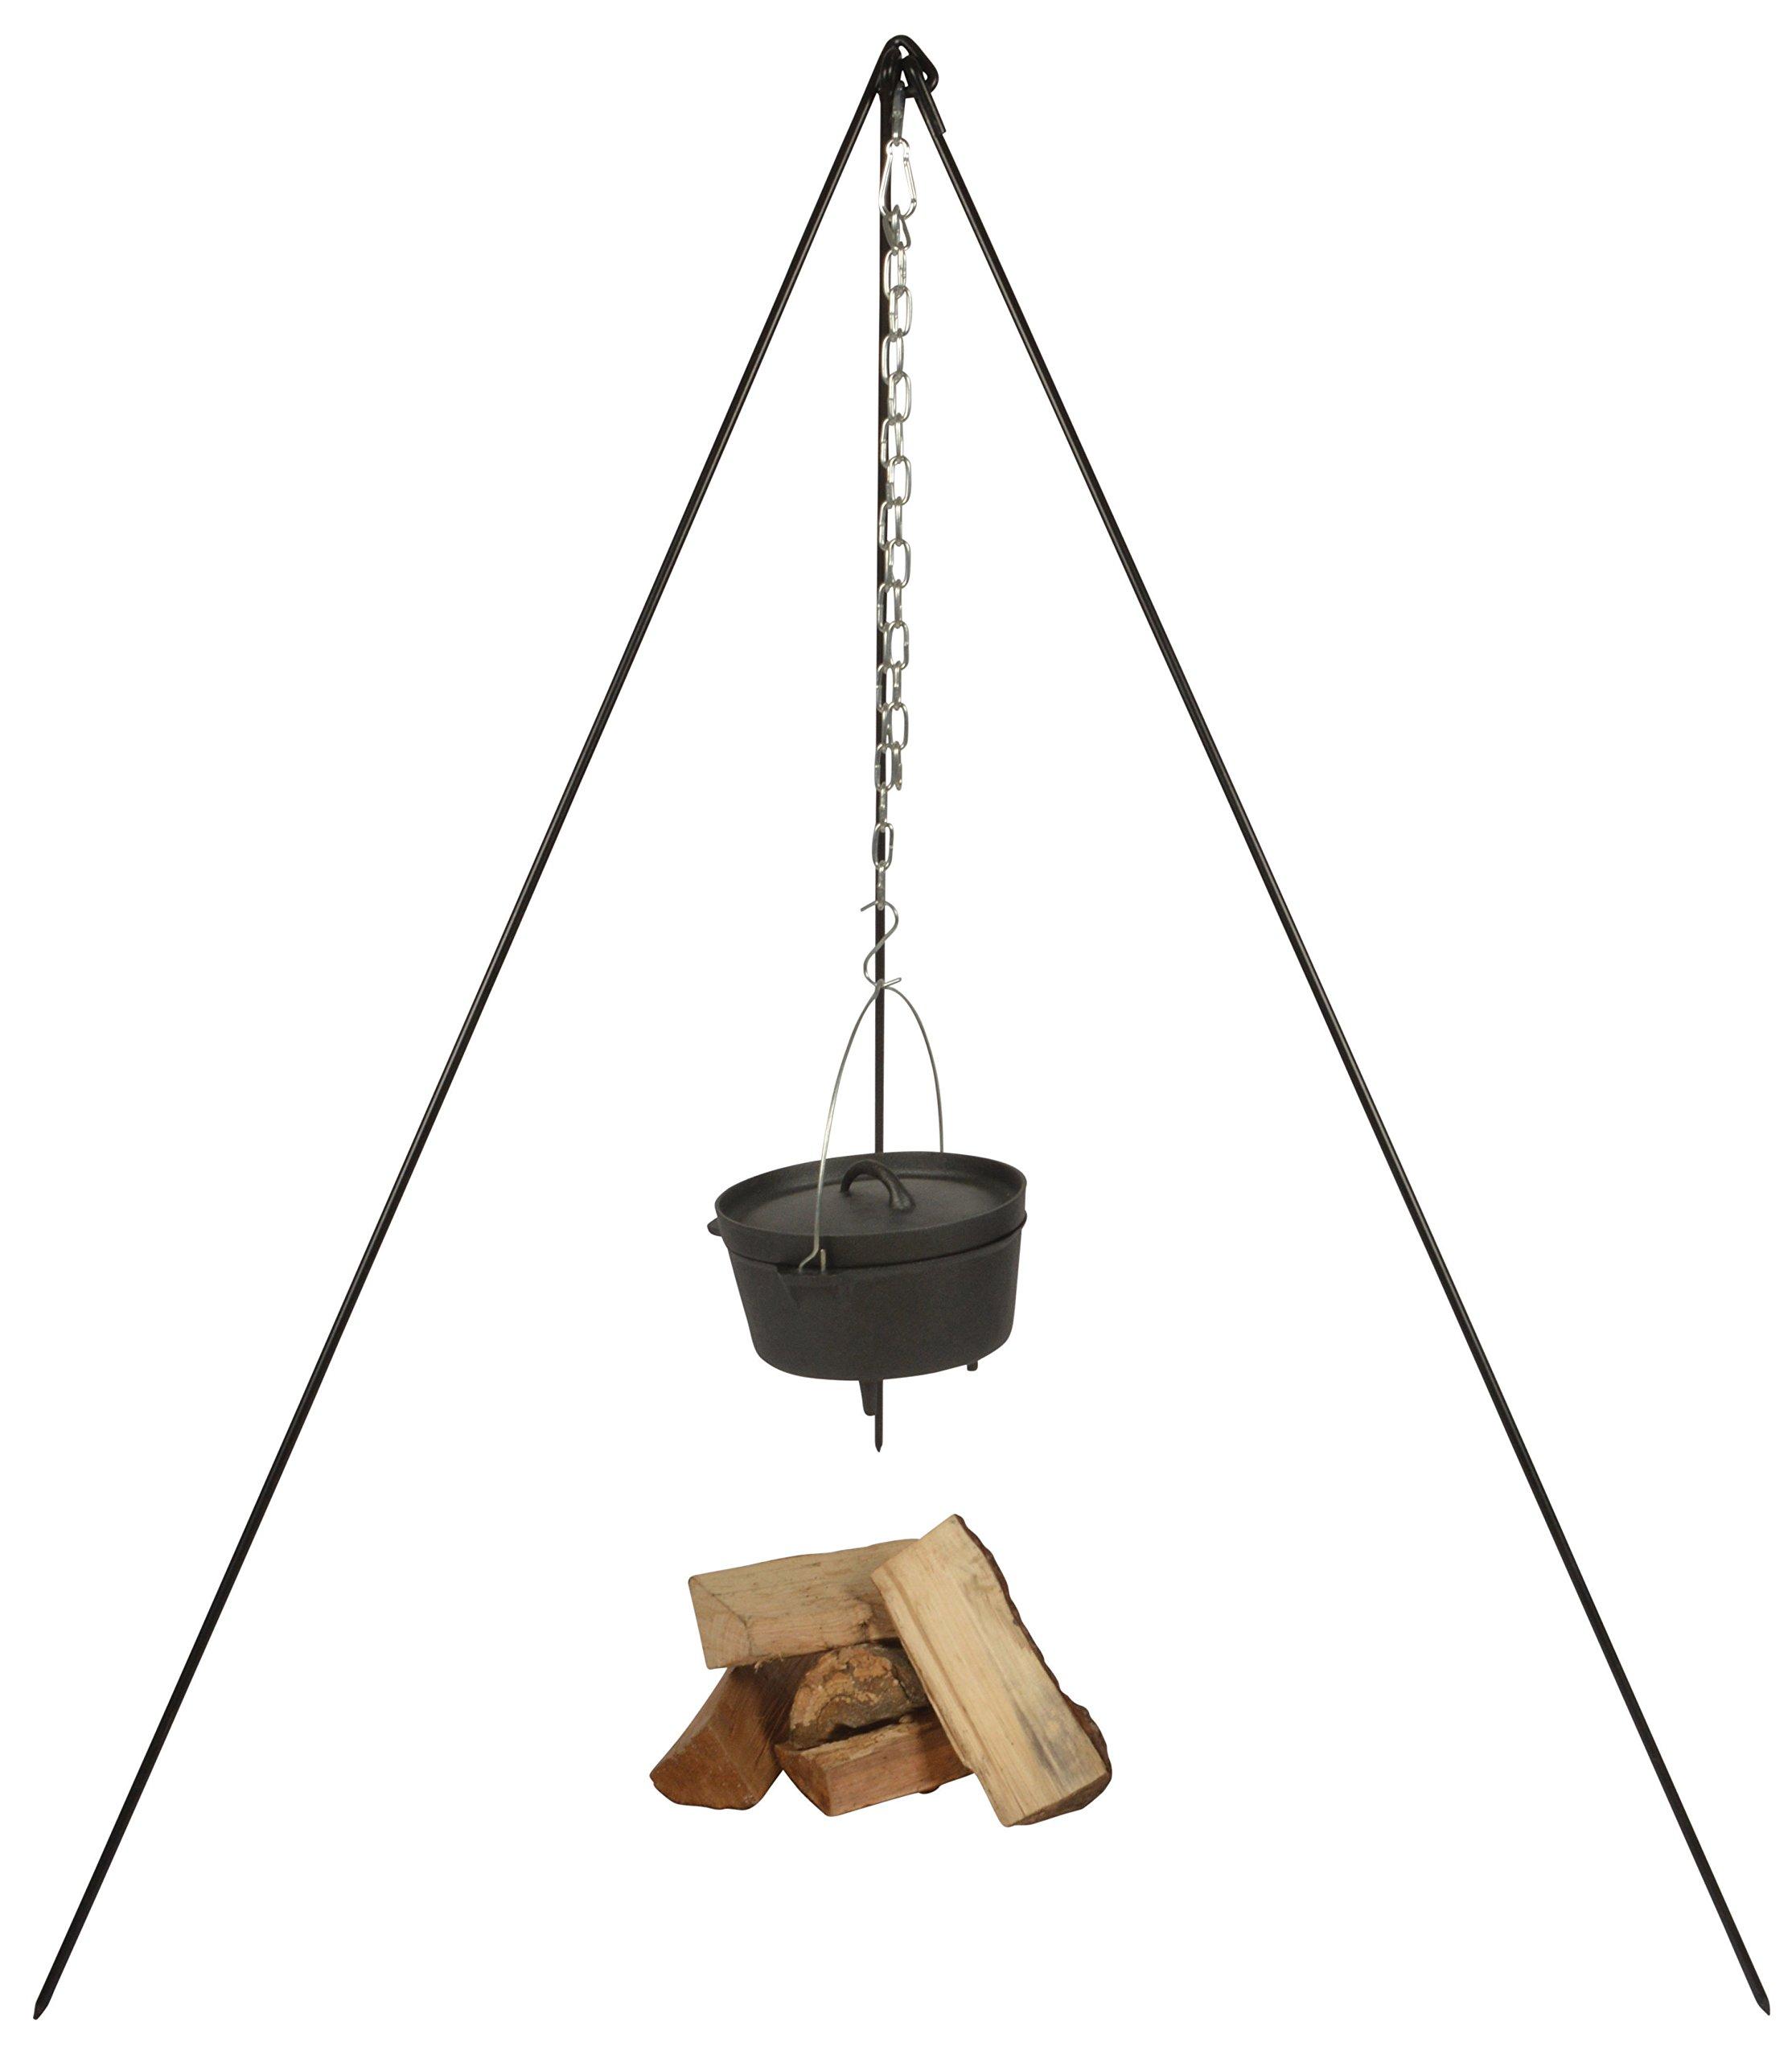 Esschert's Design FF218 Tripod Stand With Chain